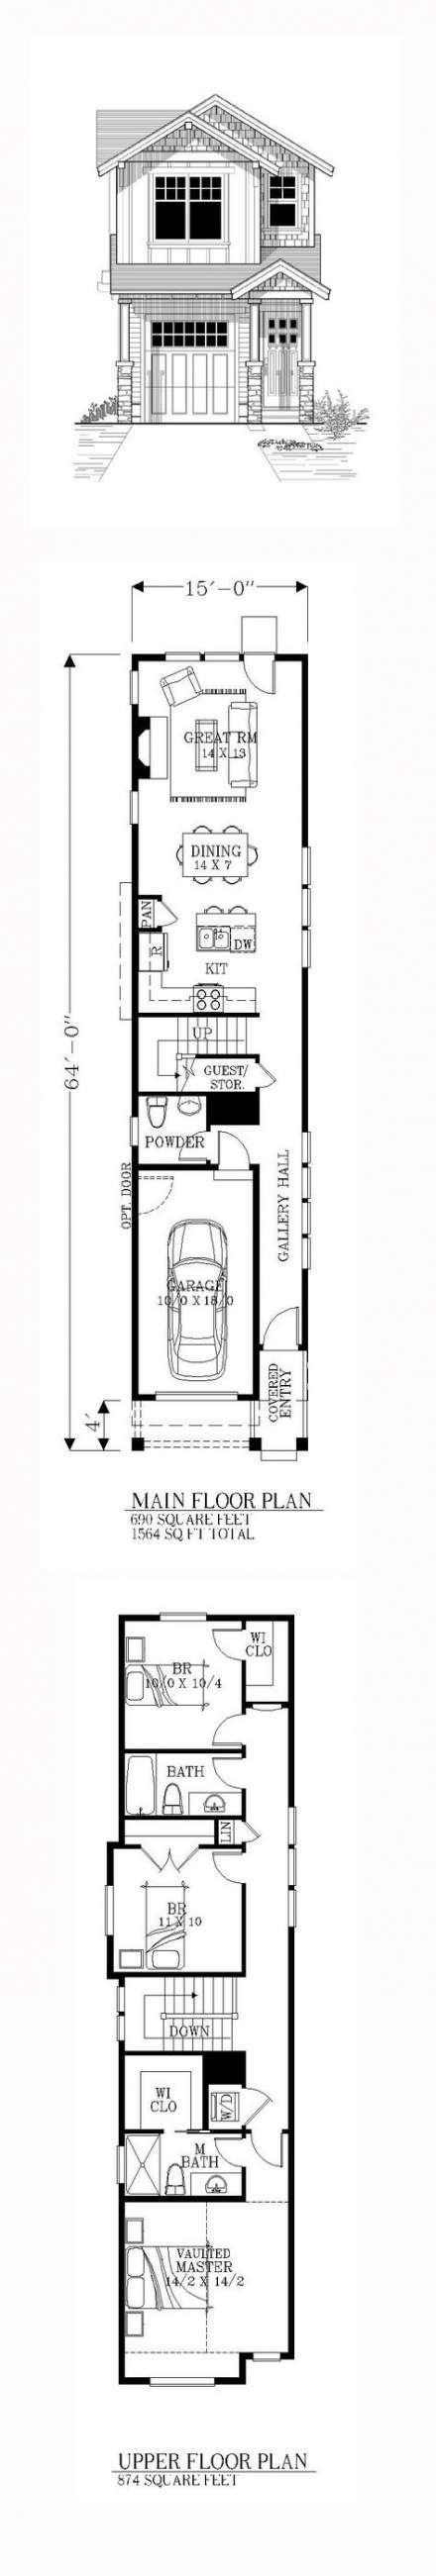 House Plans Long Narrow 52 Ideas Narrow House Plans Narrow Lot House Plans House Blueprints